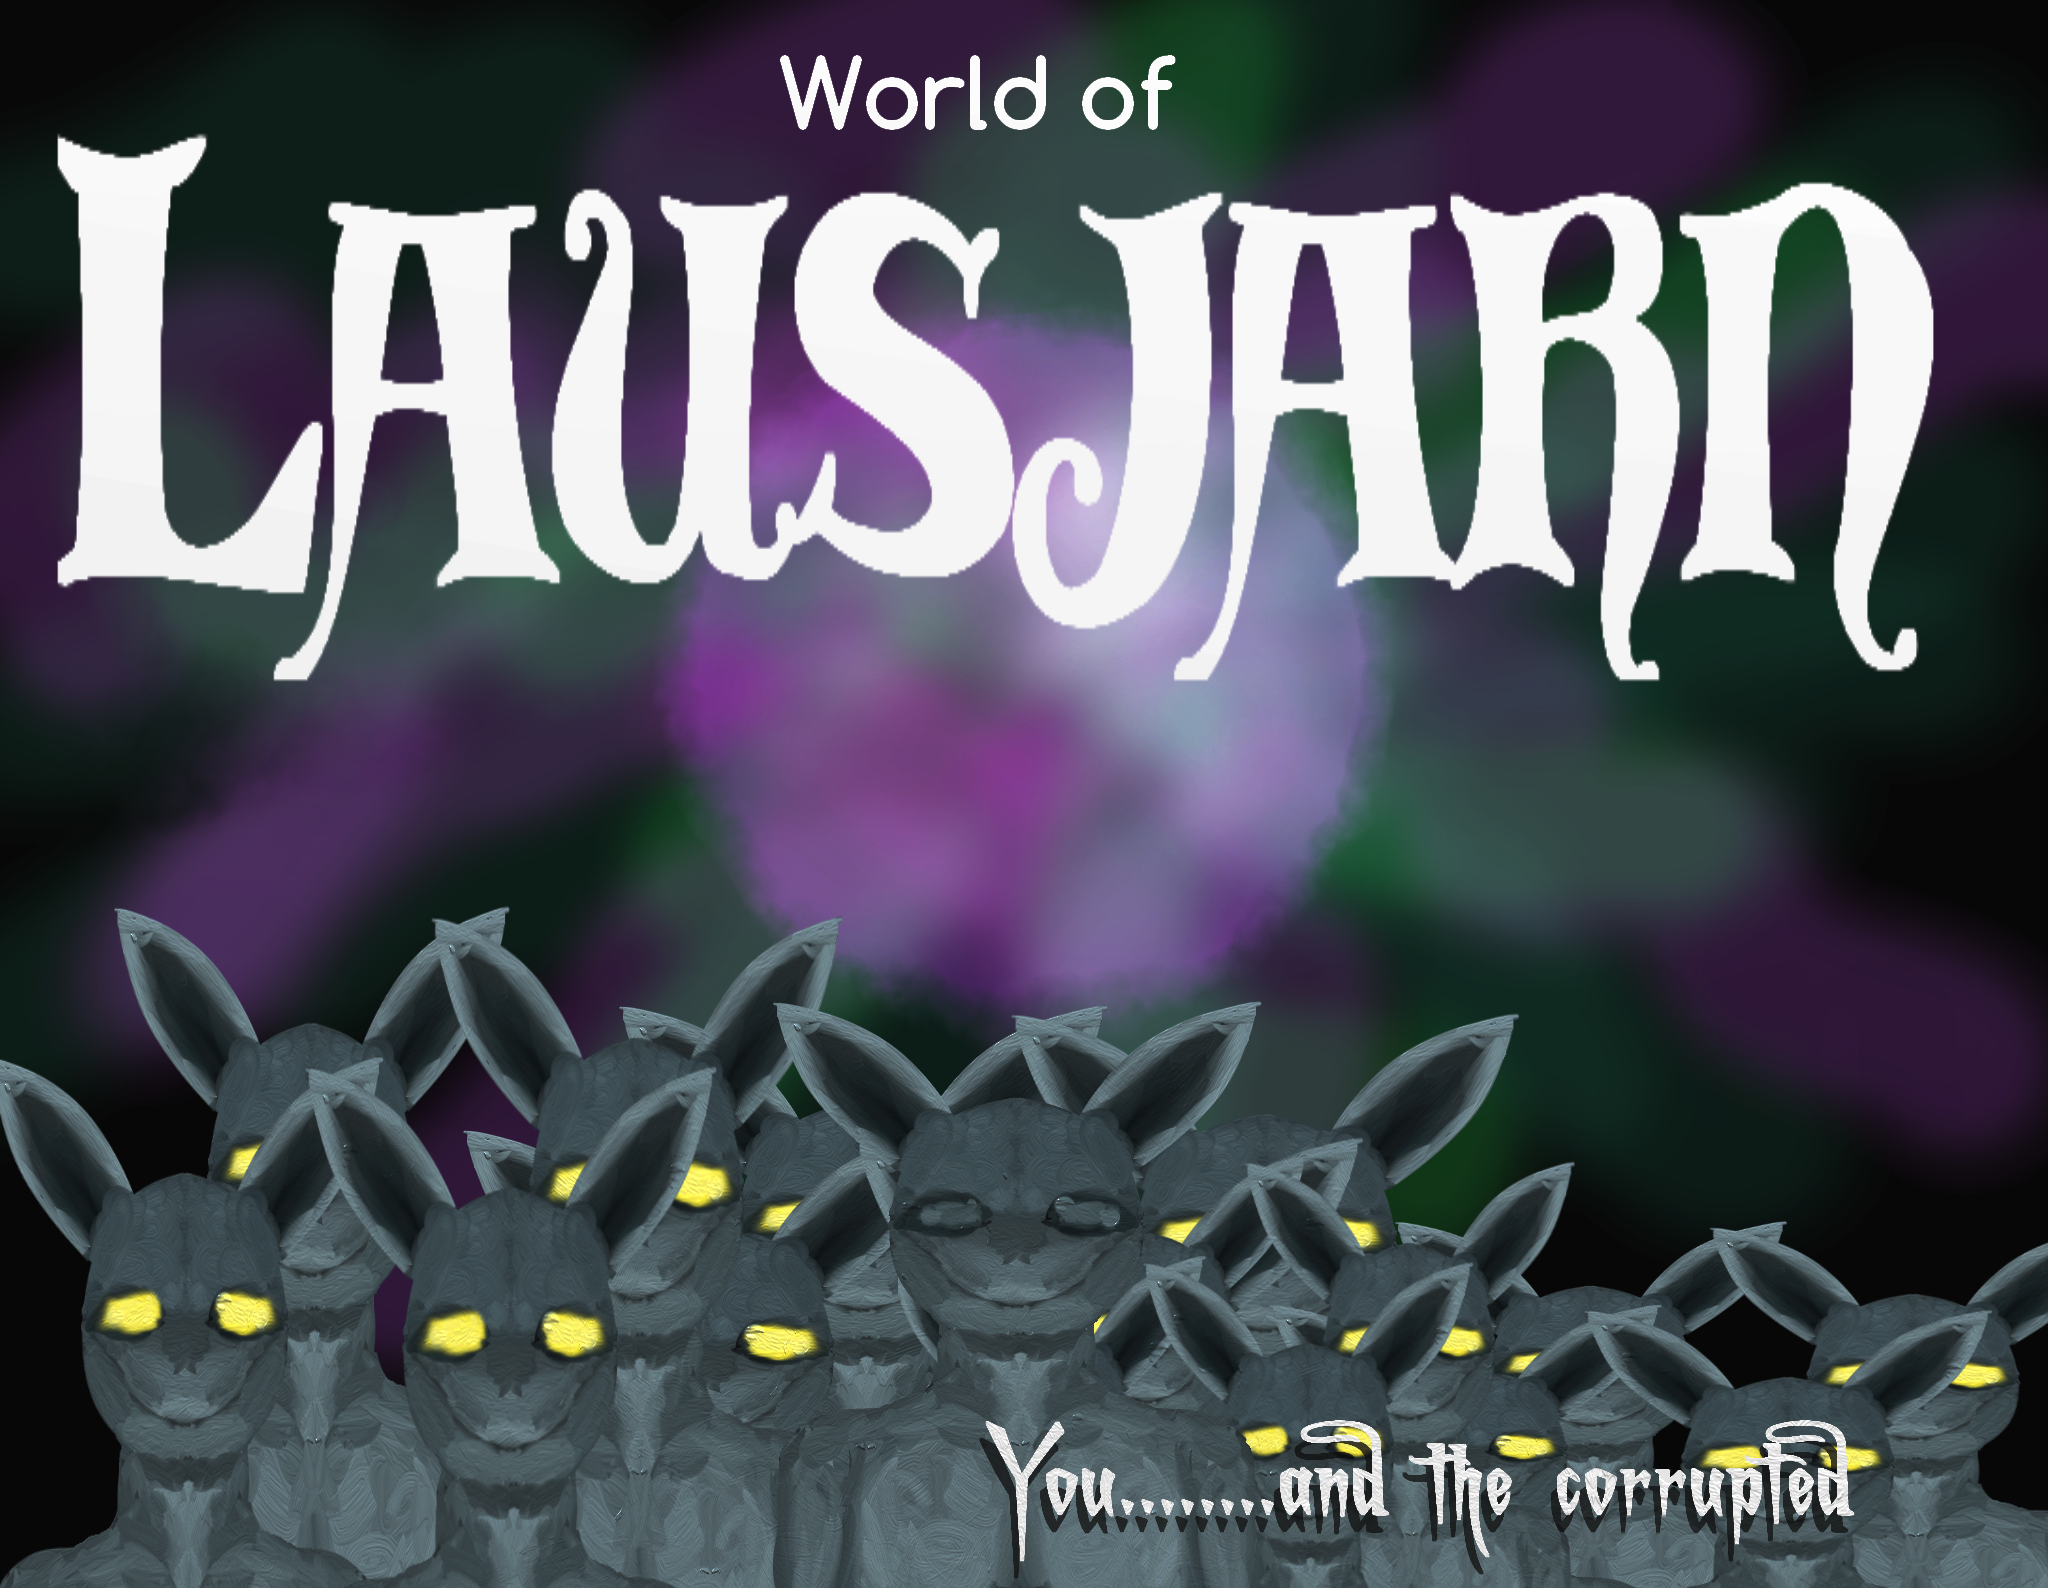 World of Lausjarn